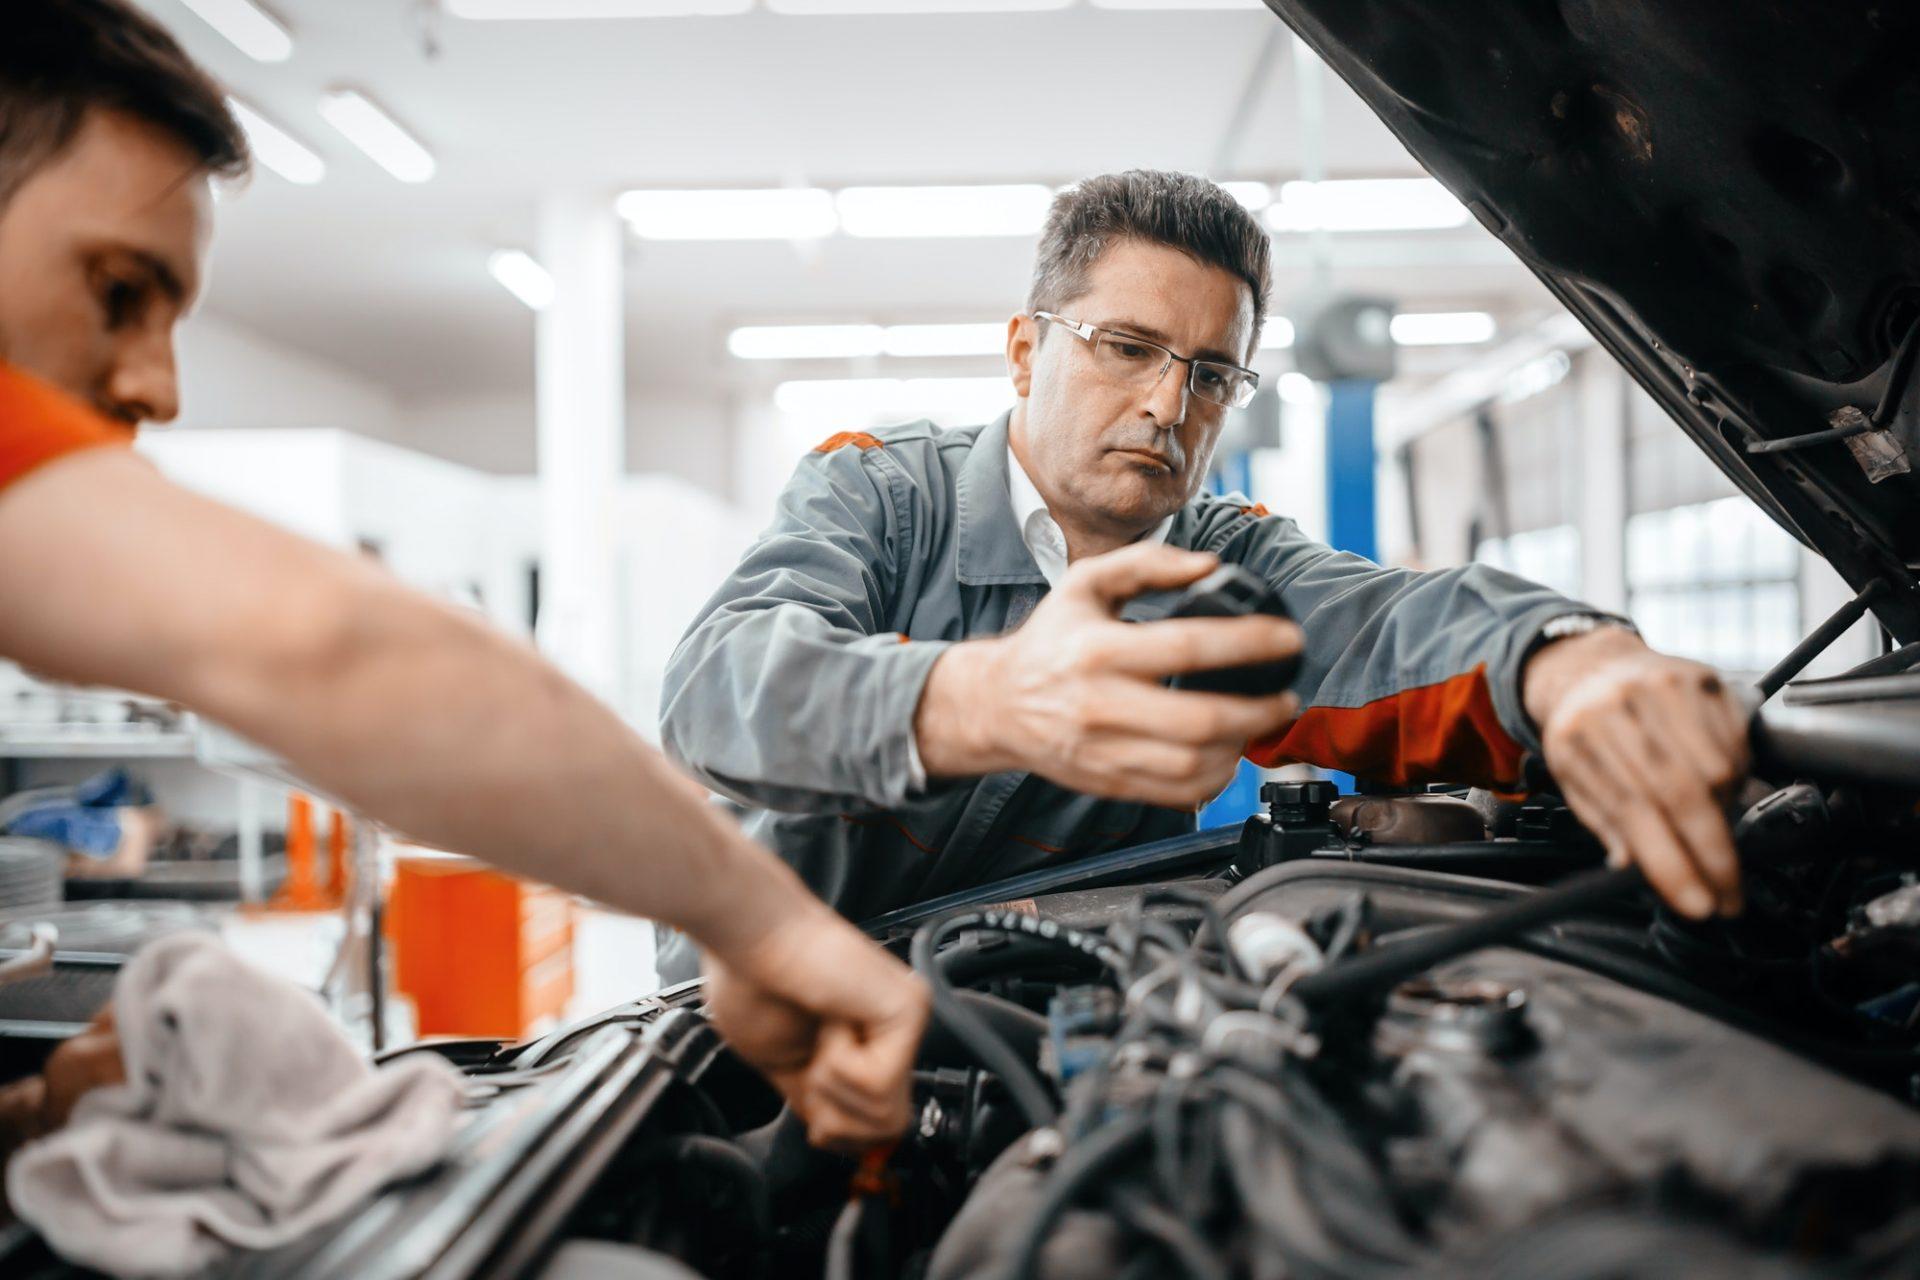 Car mechanics working and maintaining car